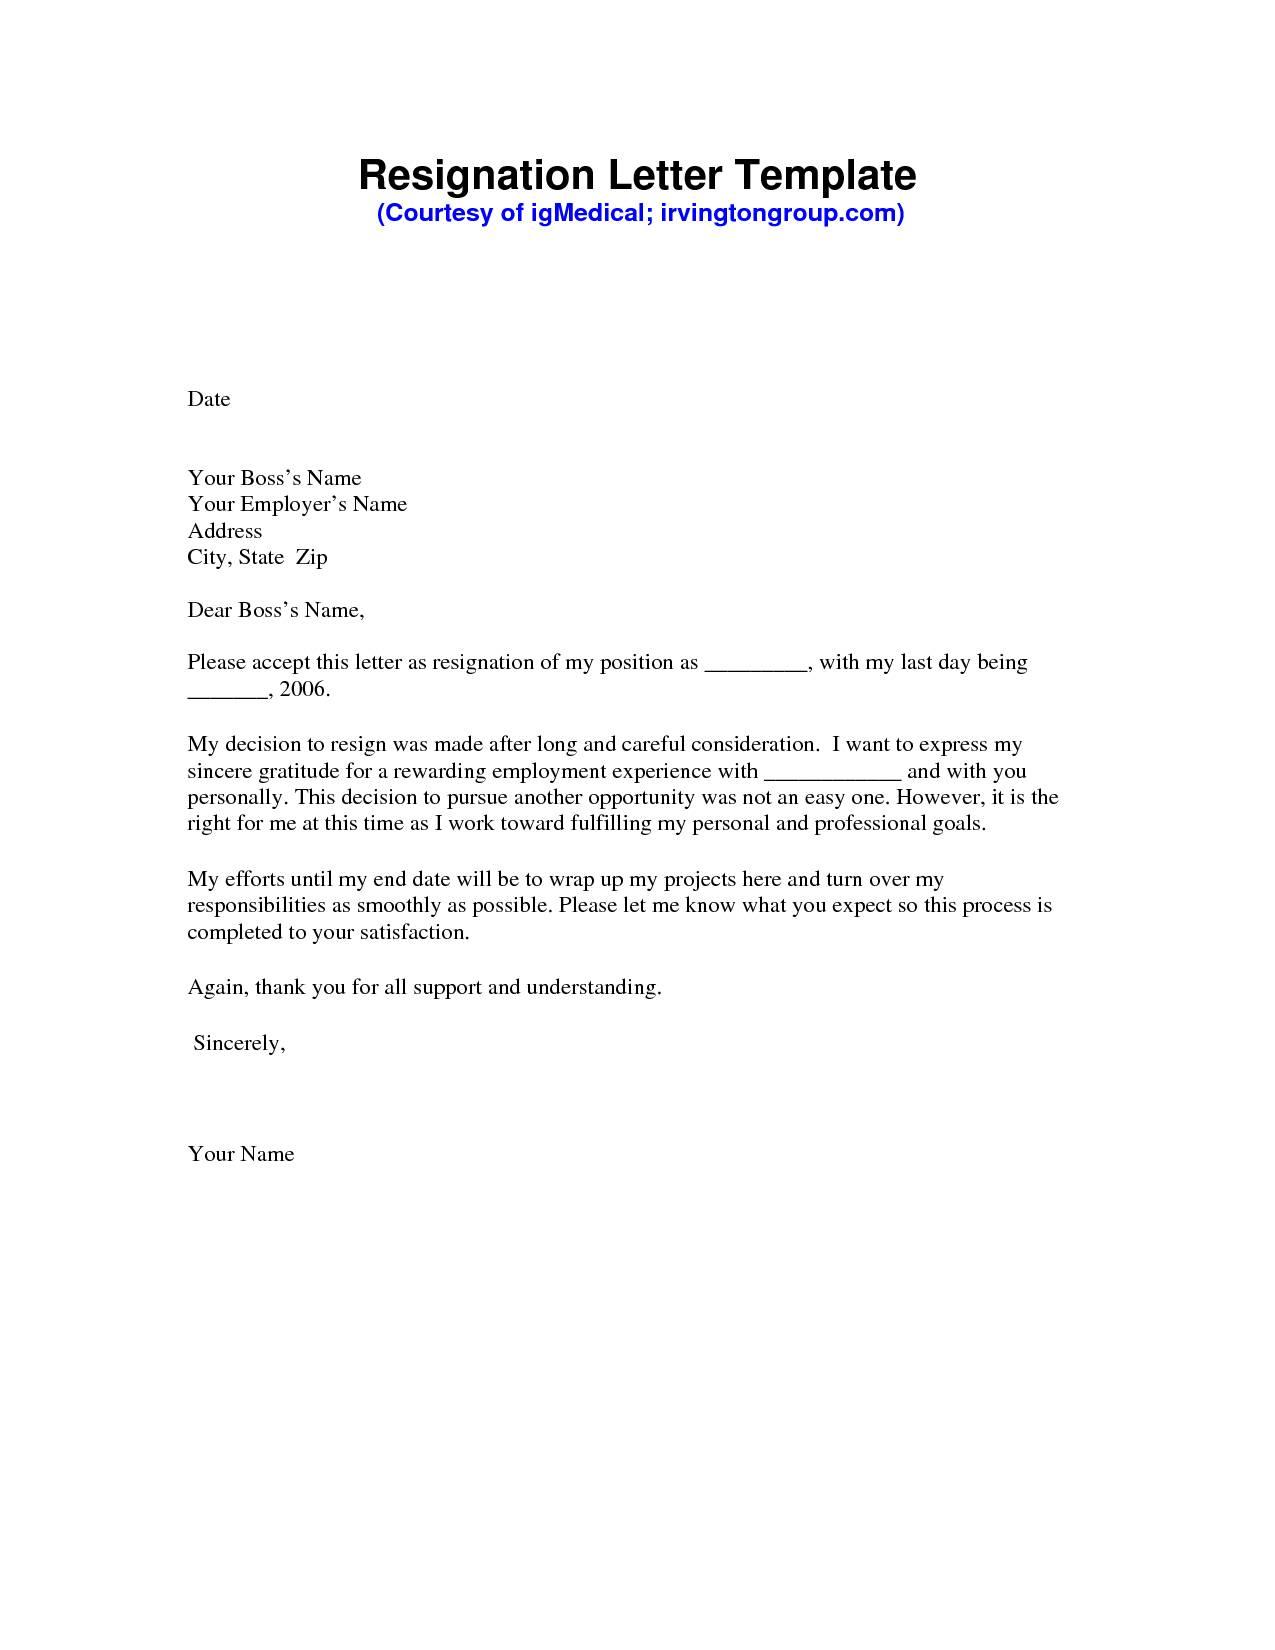 Resignation Letter Sample Template Free